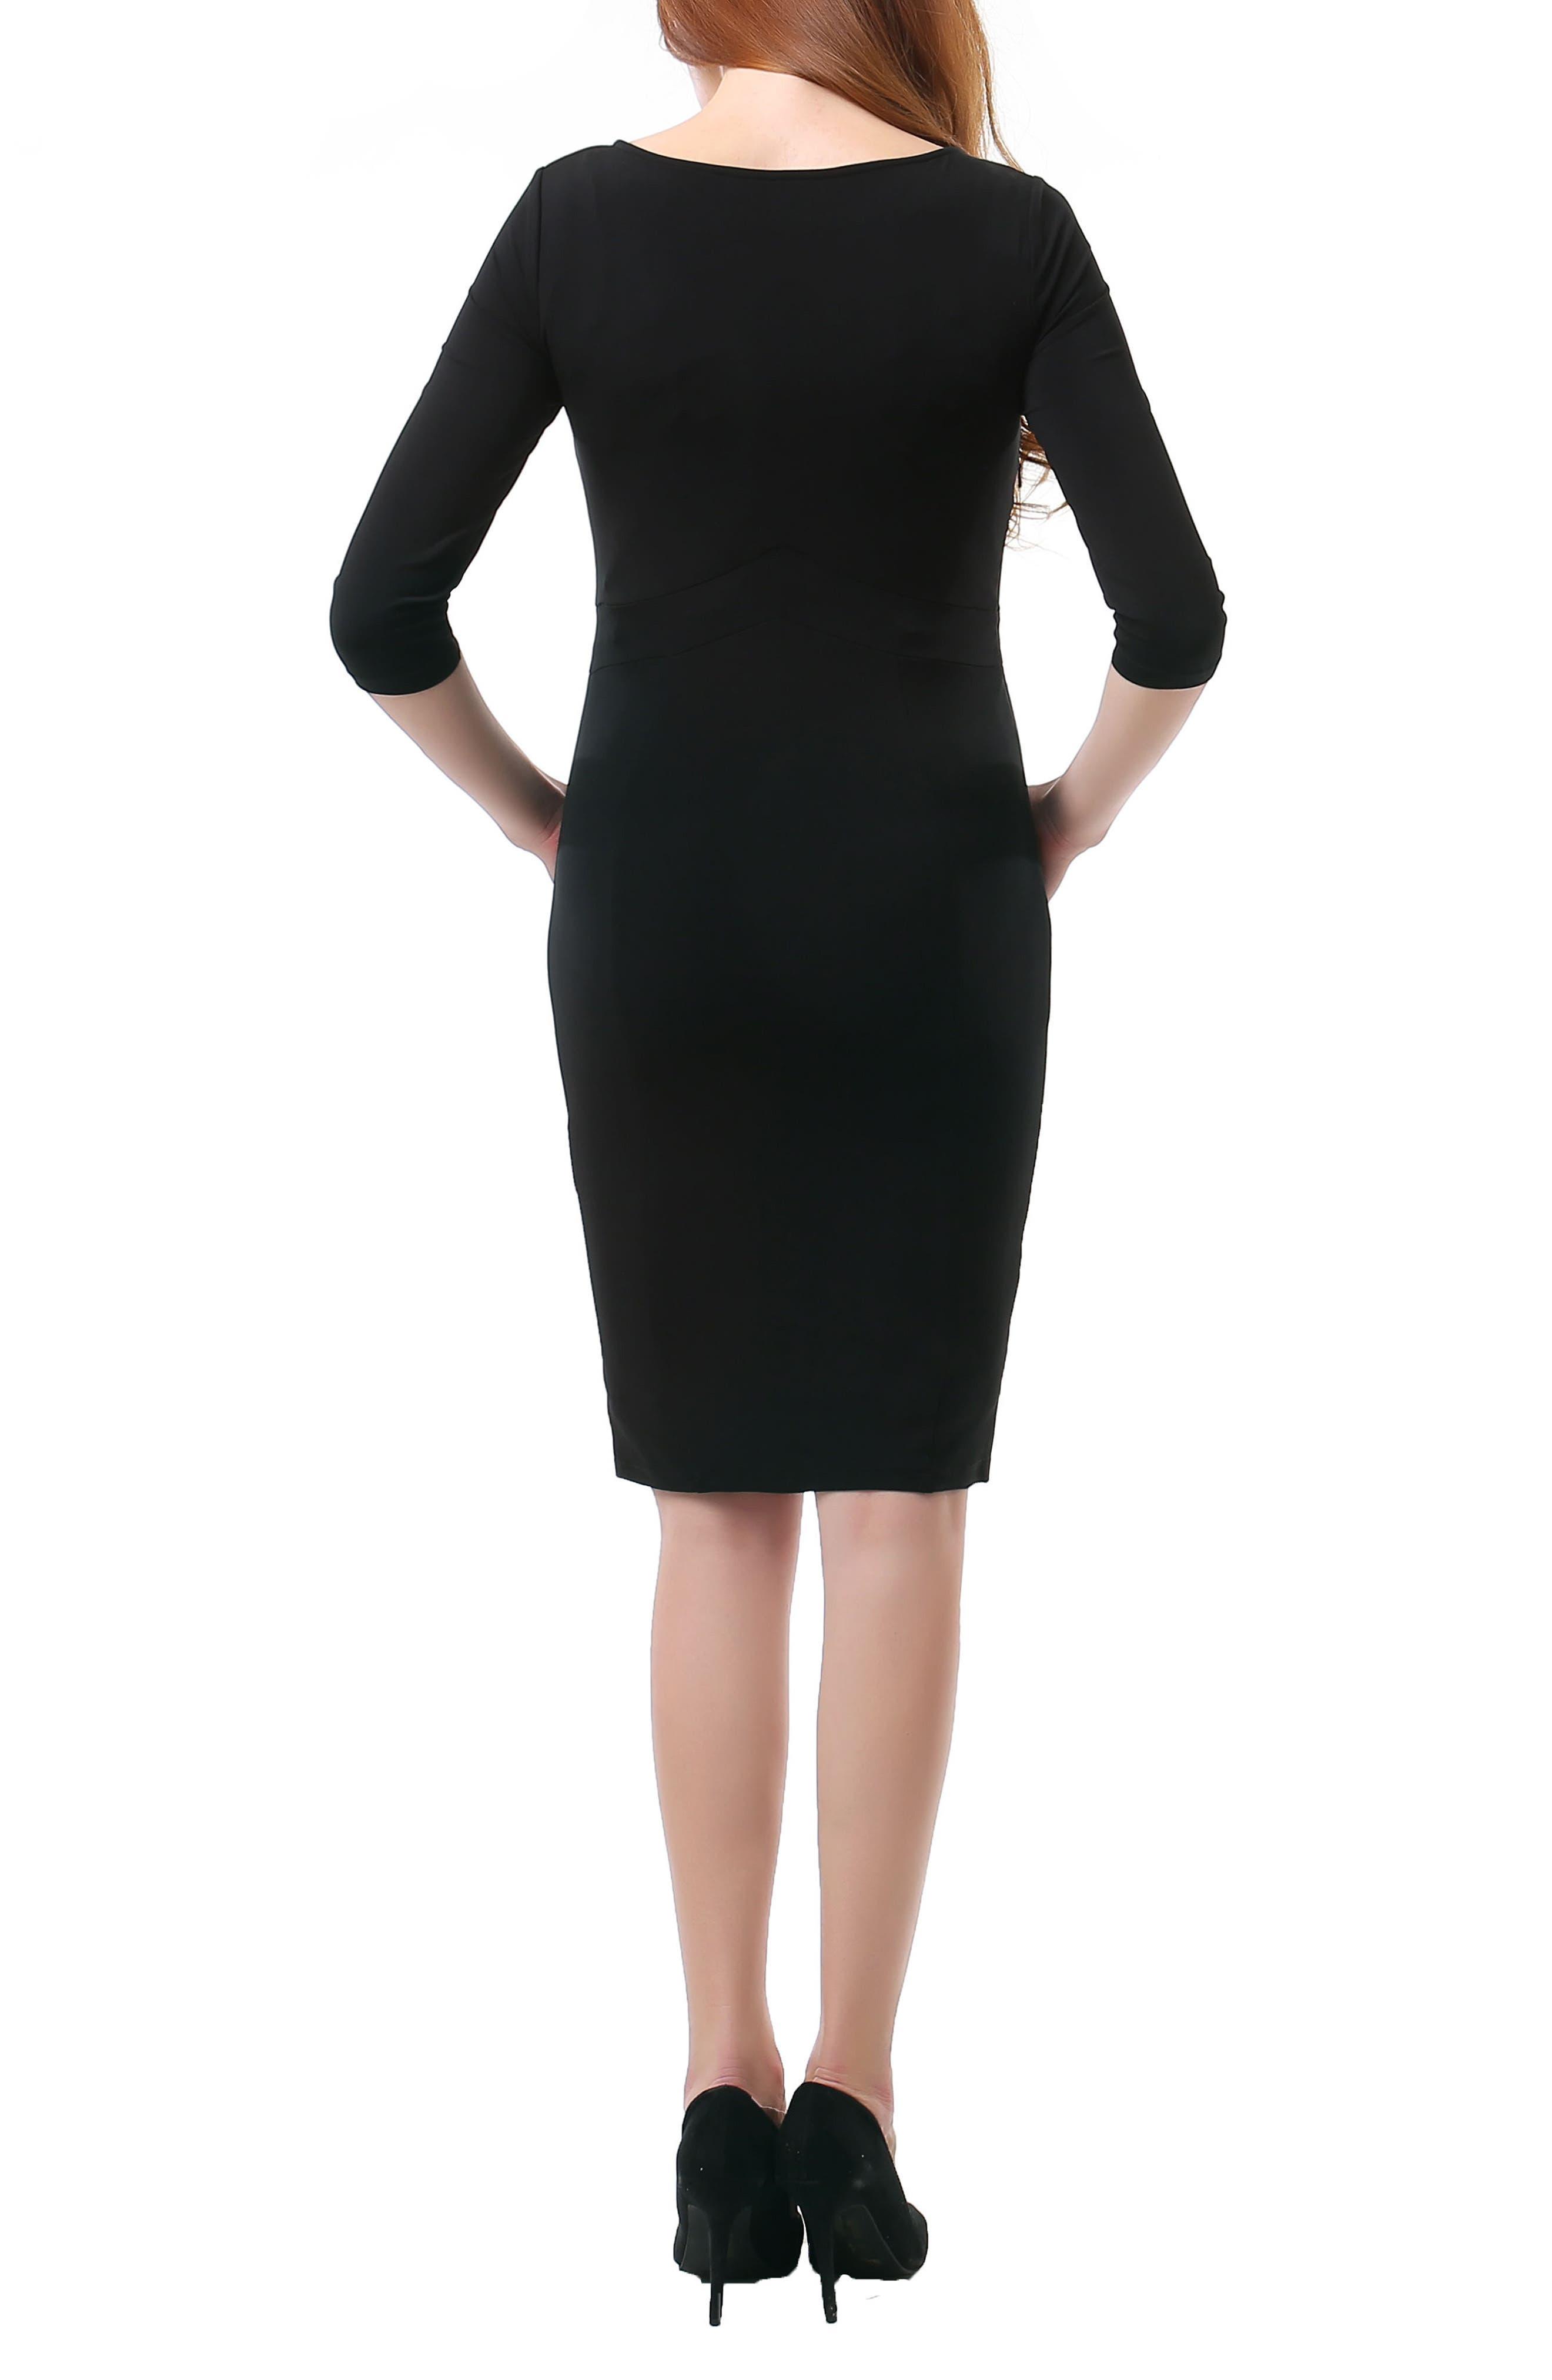 Meredith Maternity Dress,                             Alternate thumbnail 2, color,                             Black